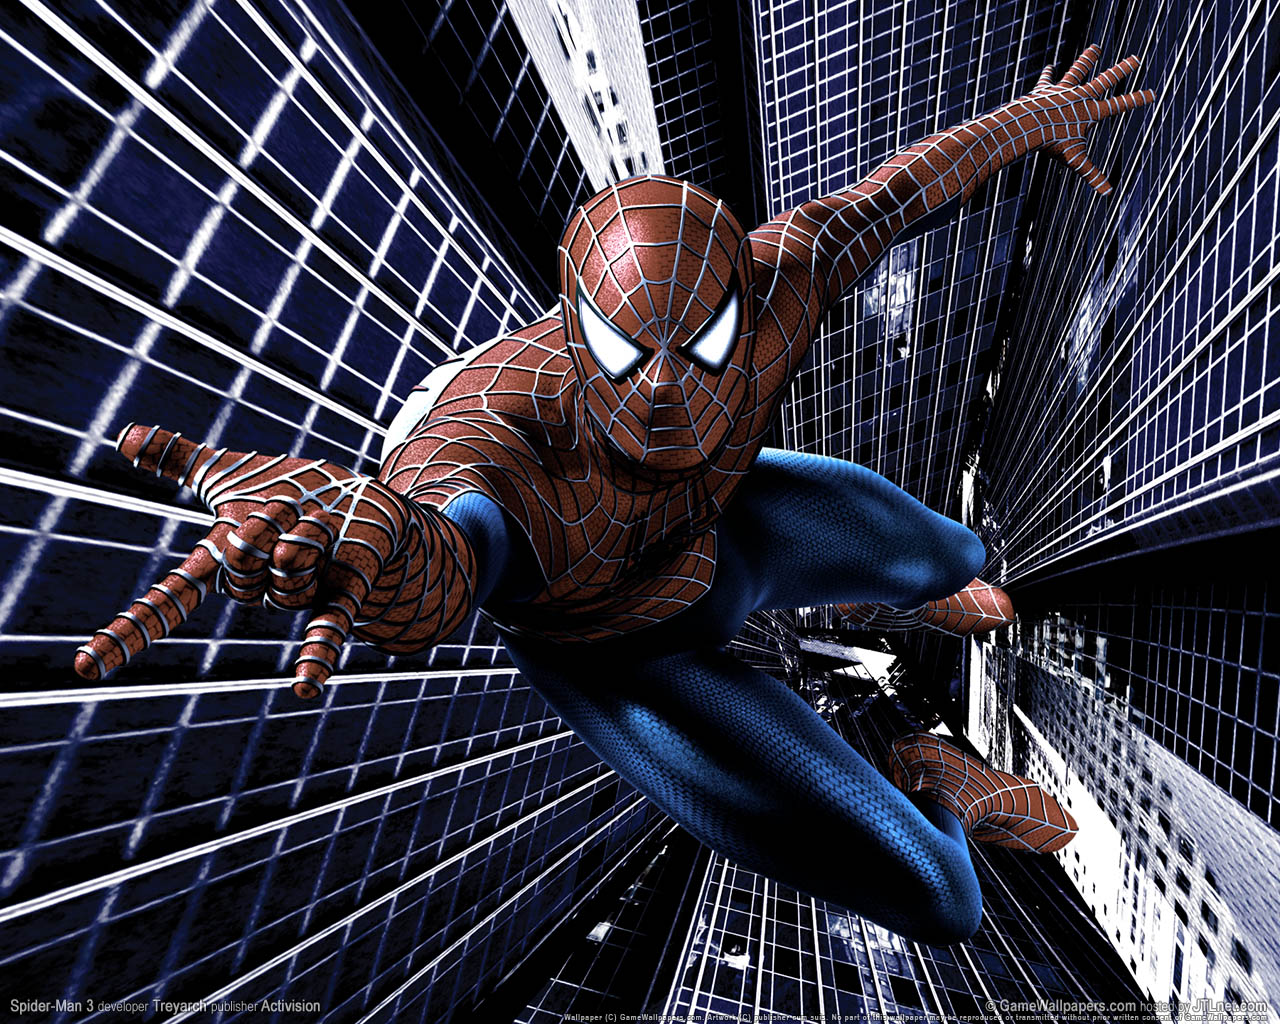 http://3.bp.blogspot.com/_Vgv1ZrLIwWg/TINtDErB8NI/AAAAAAAADPY/sOUvYeCPhNQ/s1600/Spider-Man_The_Game.jpg